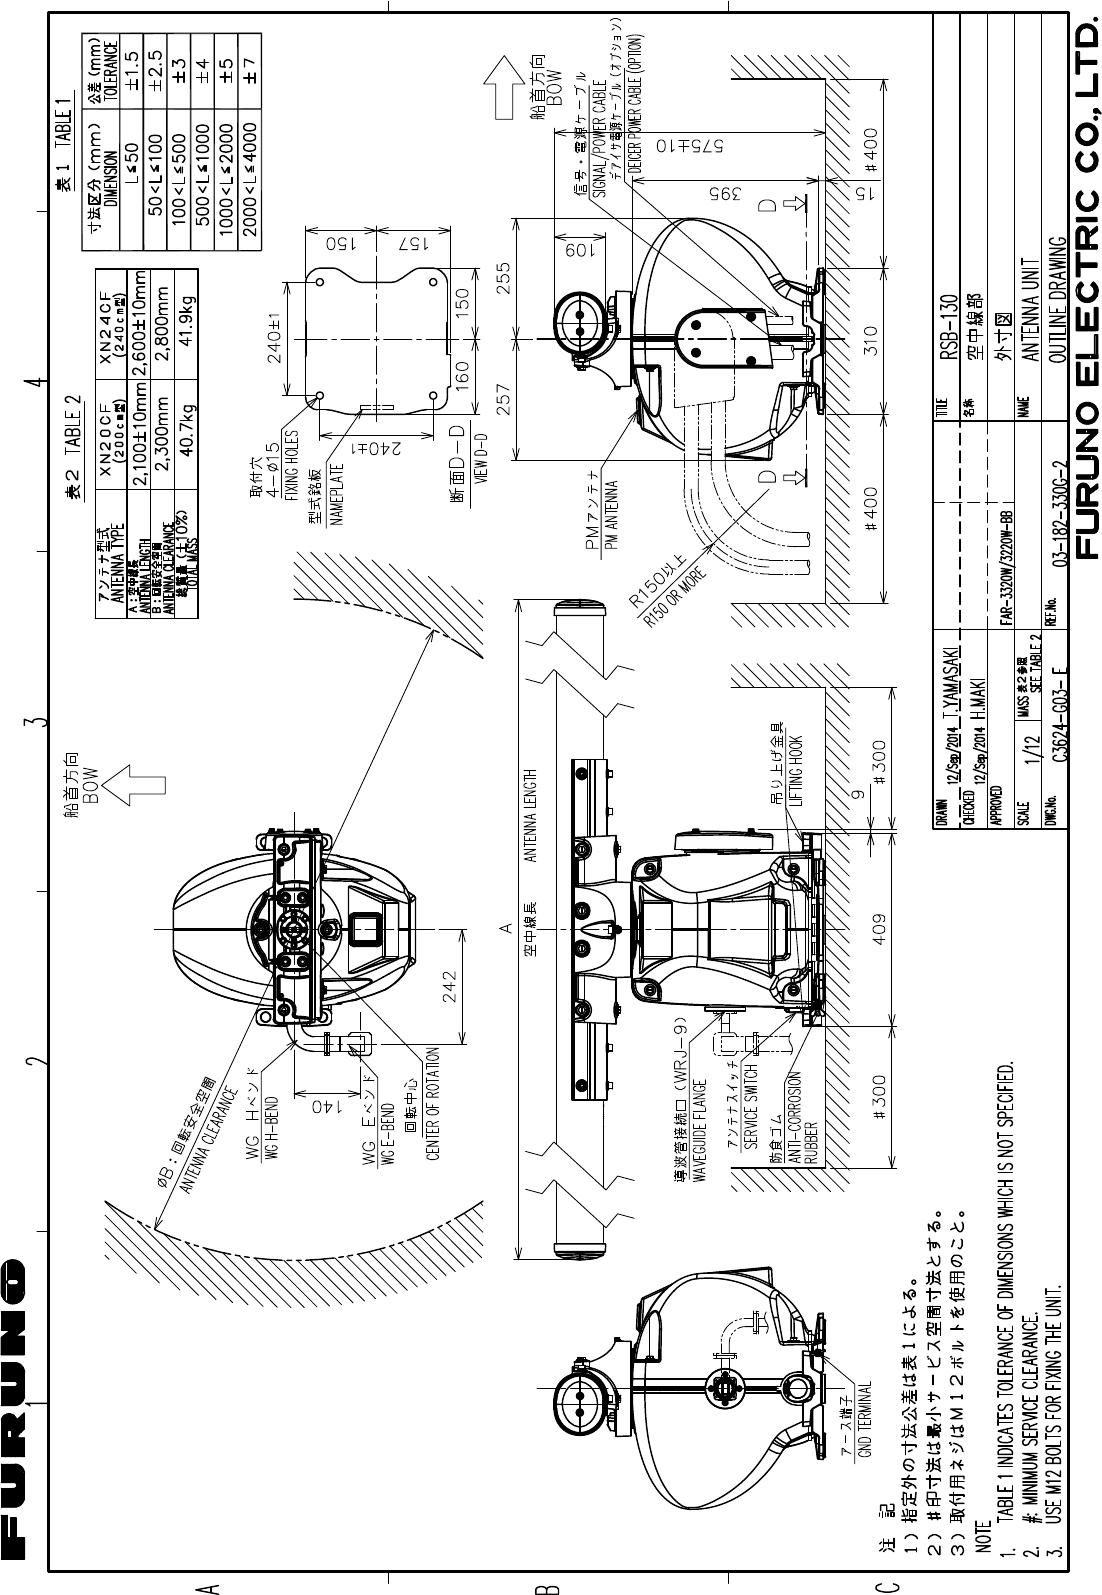 Furuno USA 9ZWRTR106 Transceiver for Radar model FAR-3220